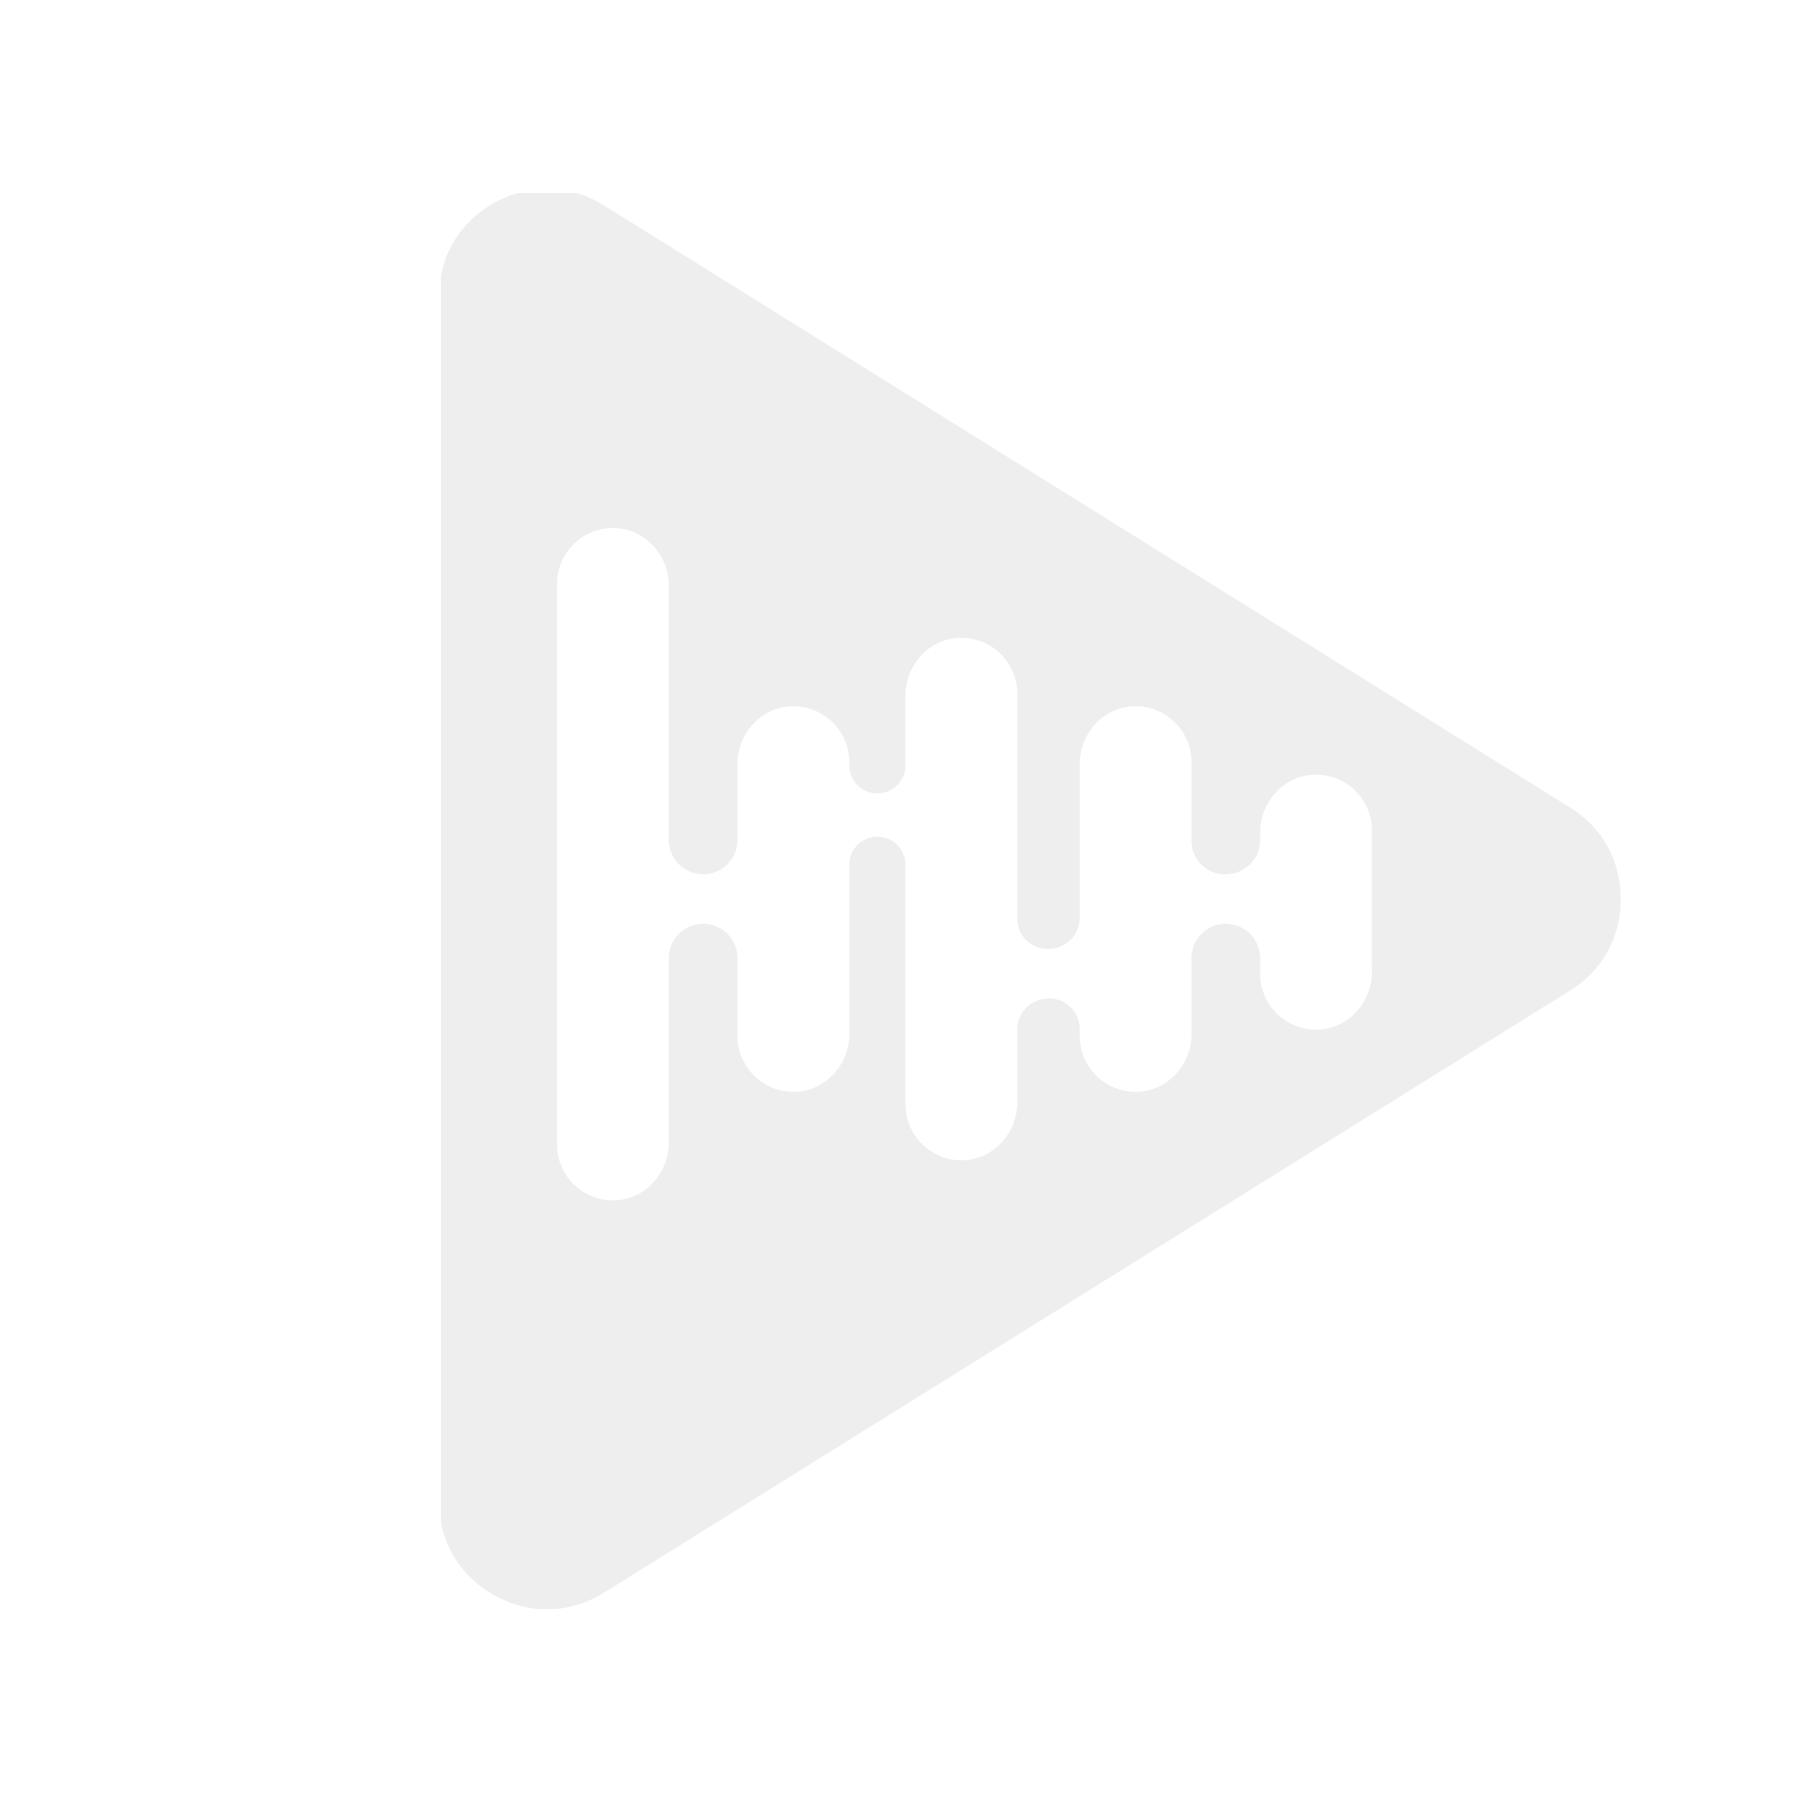 Zapco ASP-L2T